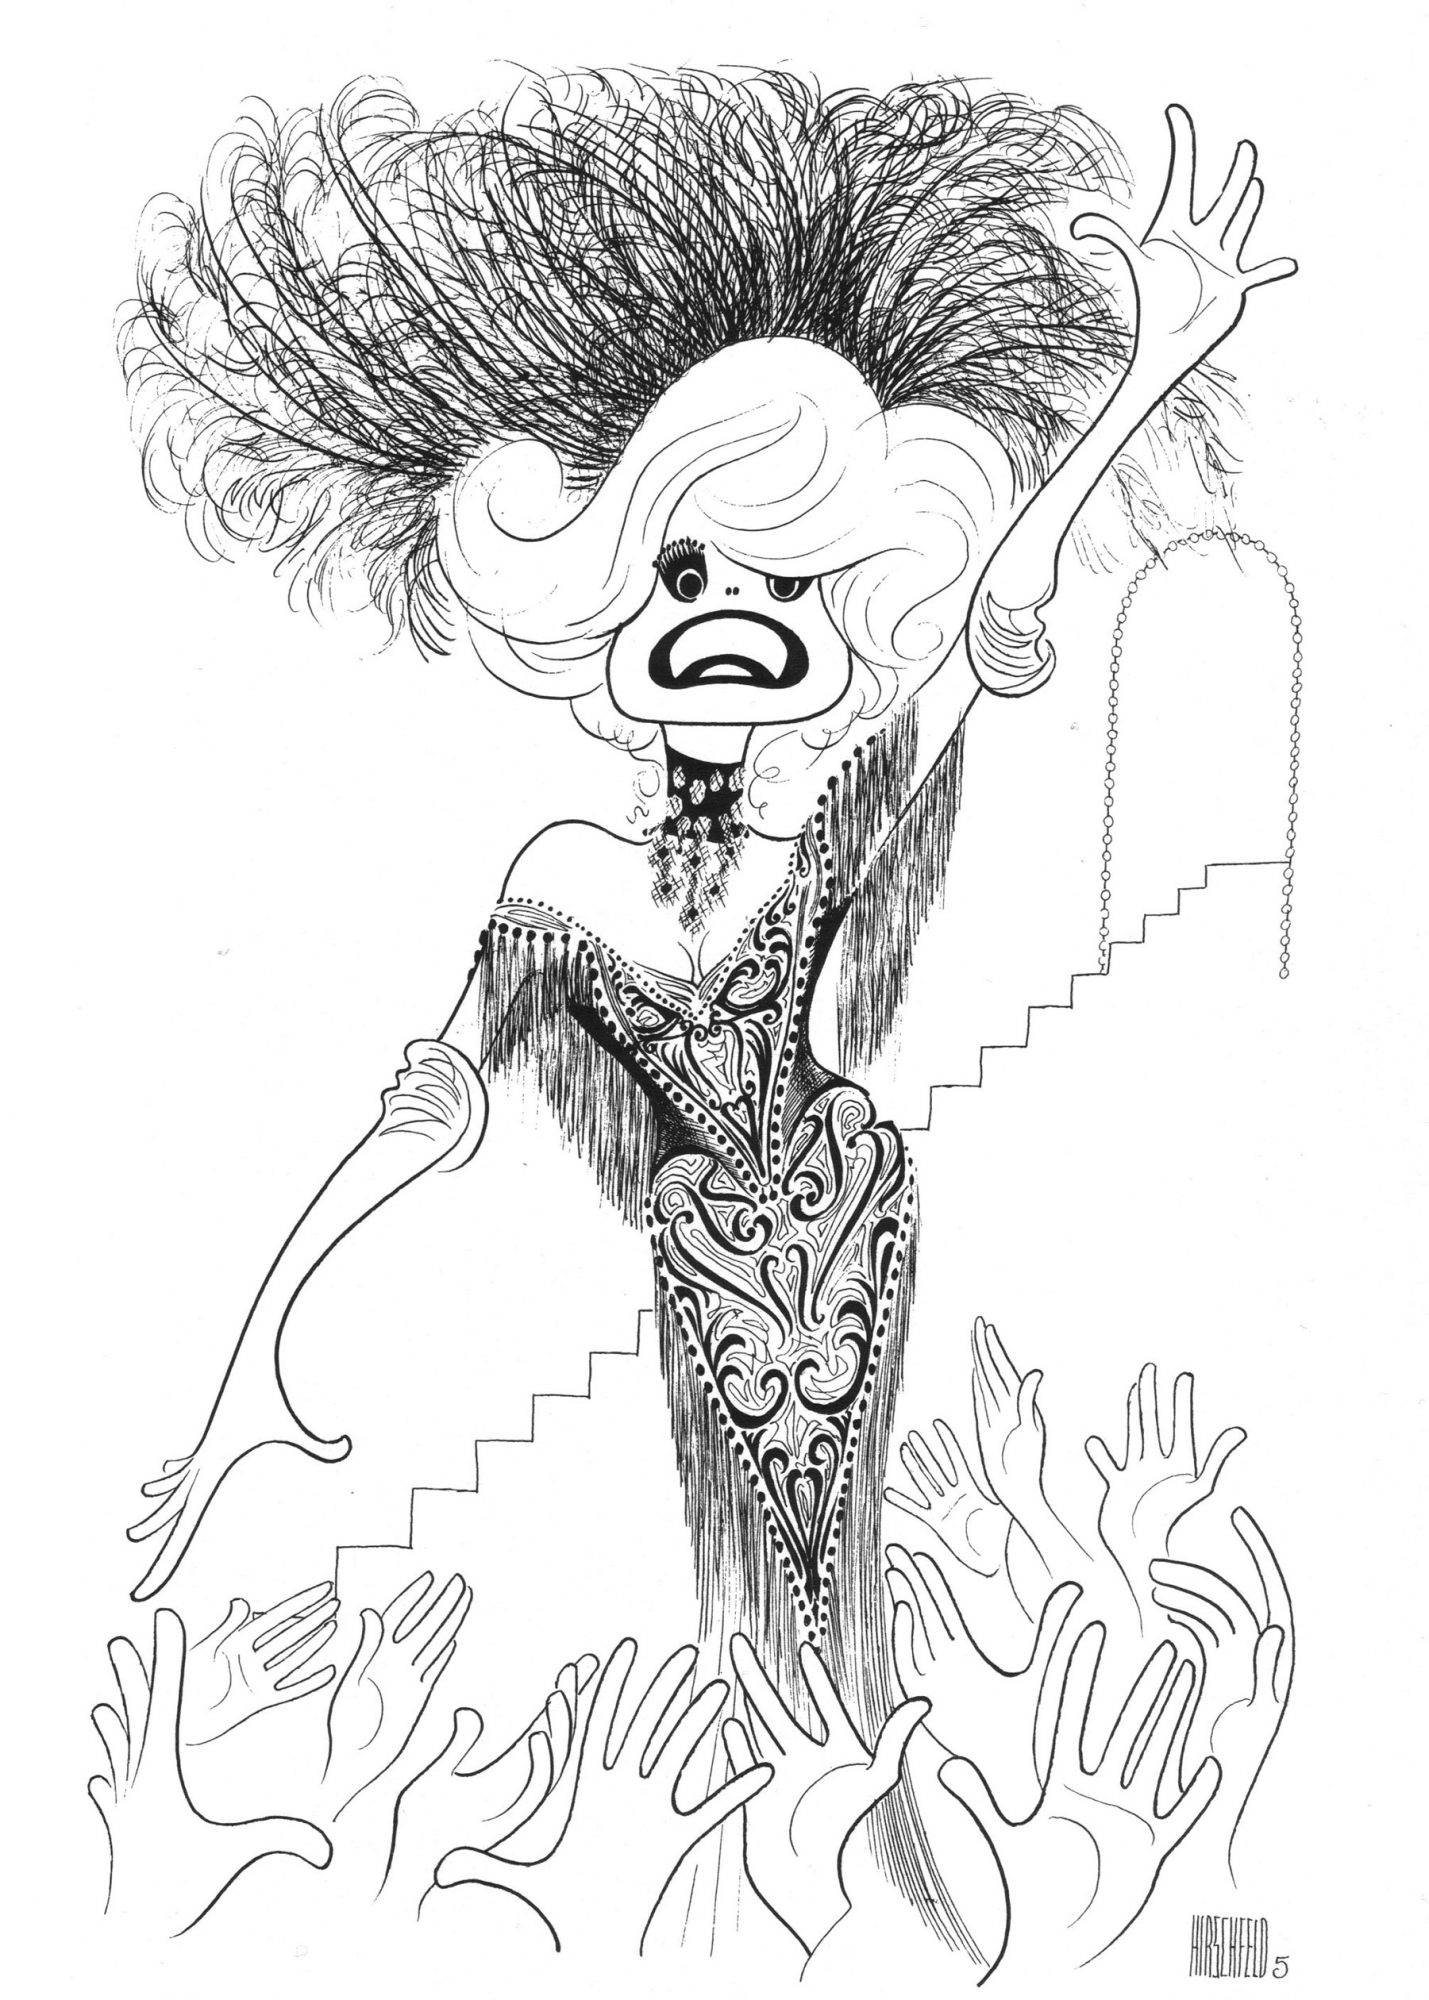 CarolChanningHelloDolly.jpg – Carol Channing in Hello, Dolly!, 1978